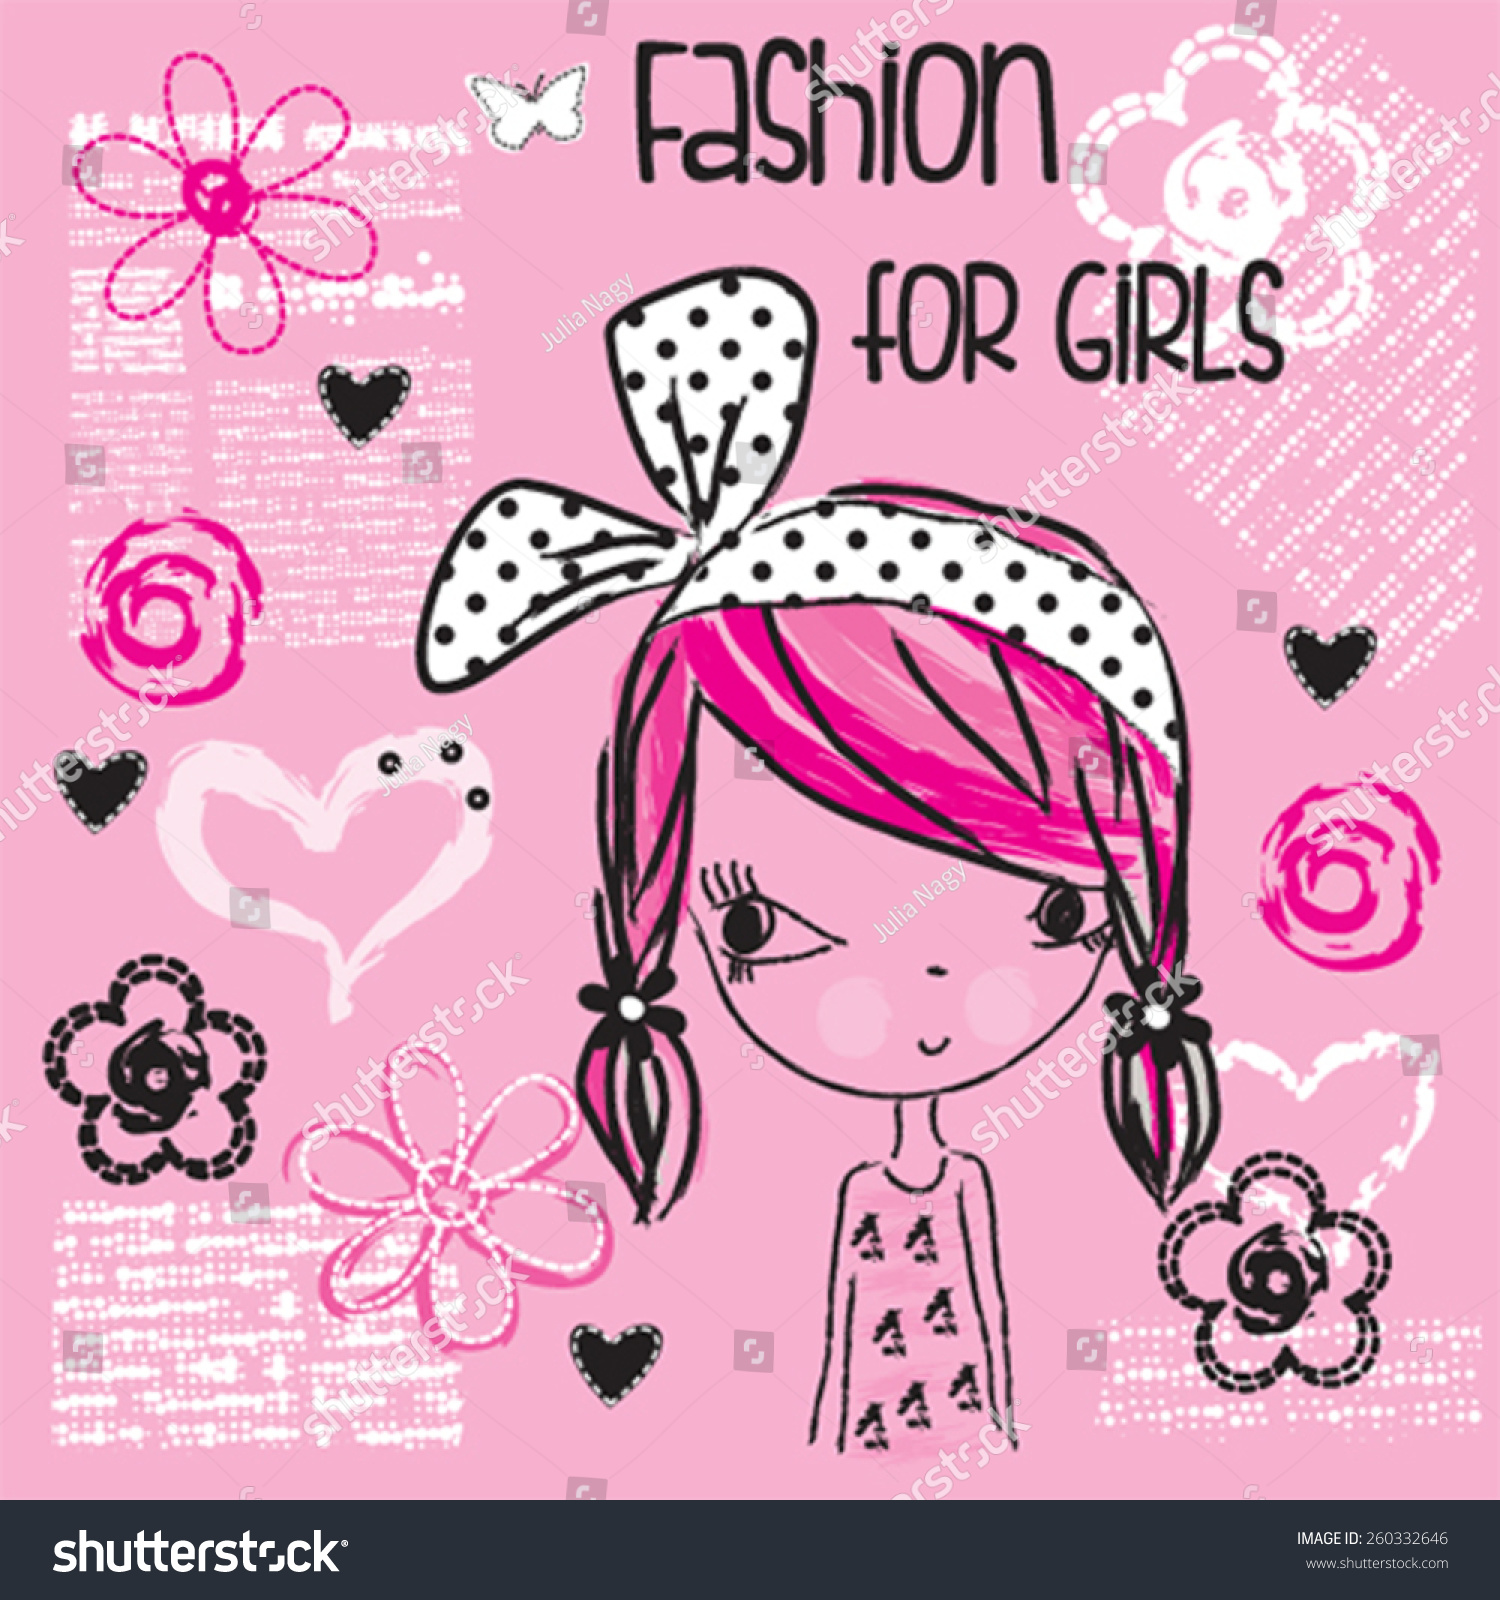 Shirt design in girl - Cute Fashionable Girl T Shirt Design Vector Illustration